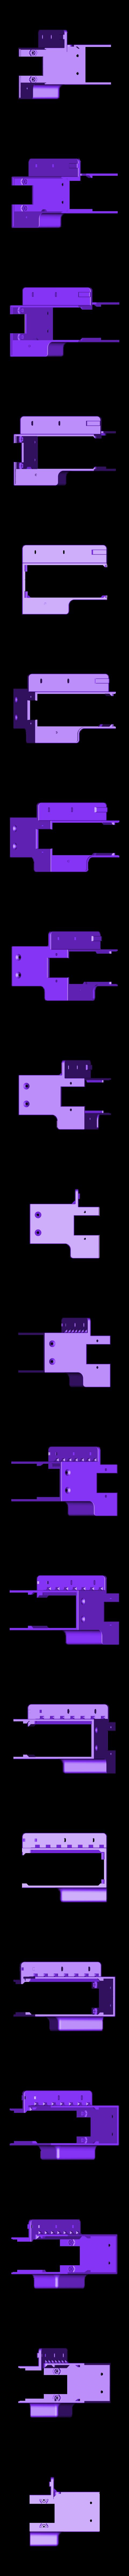 mean_mk3_Housing_01.STL Download free STL file Prusa MK3 Mean Well Power Supply (PSU) Upgrade Housing • 3D printable model, sneaks